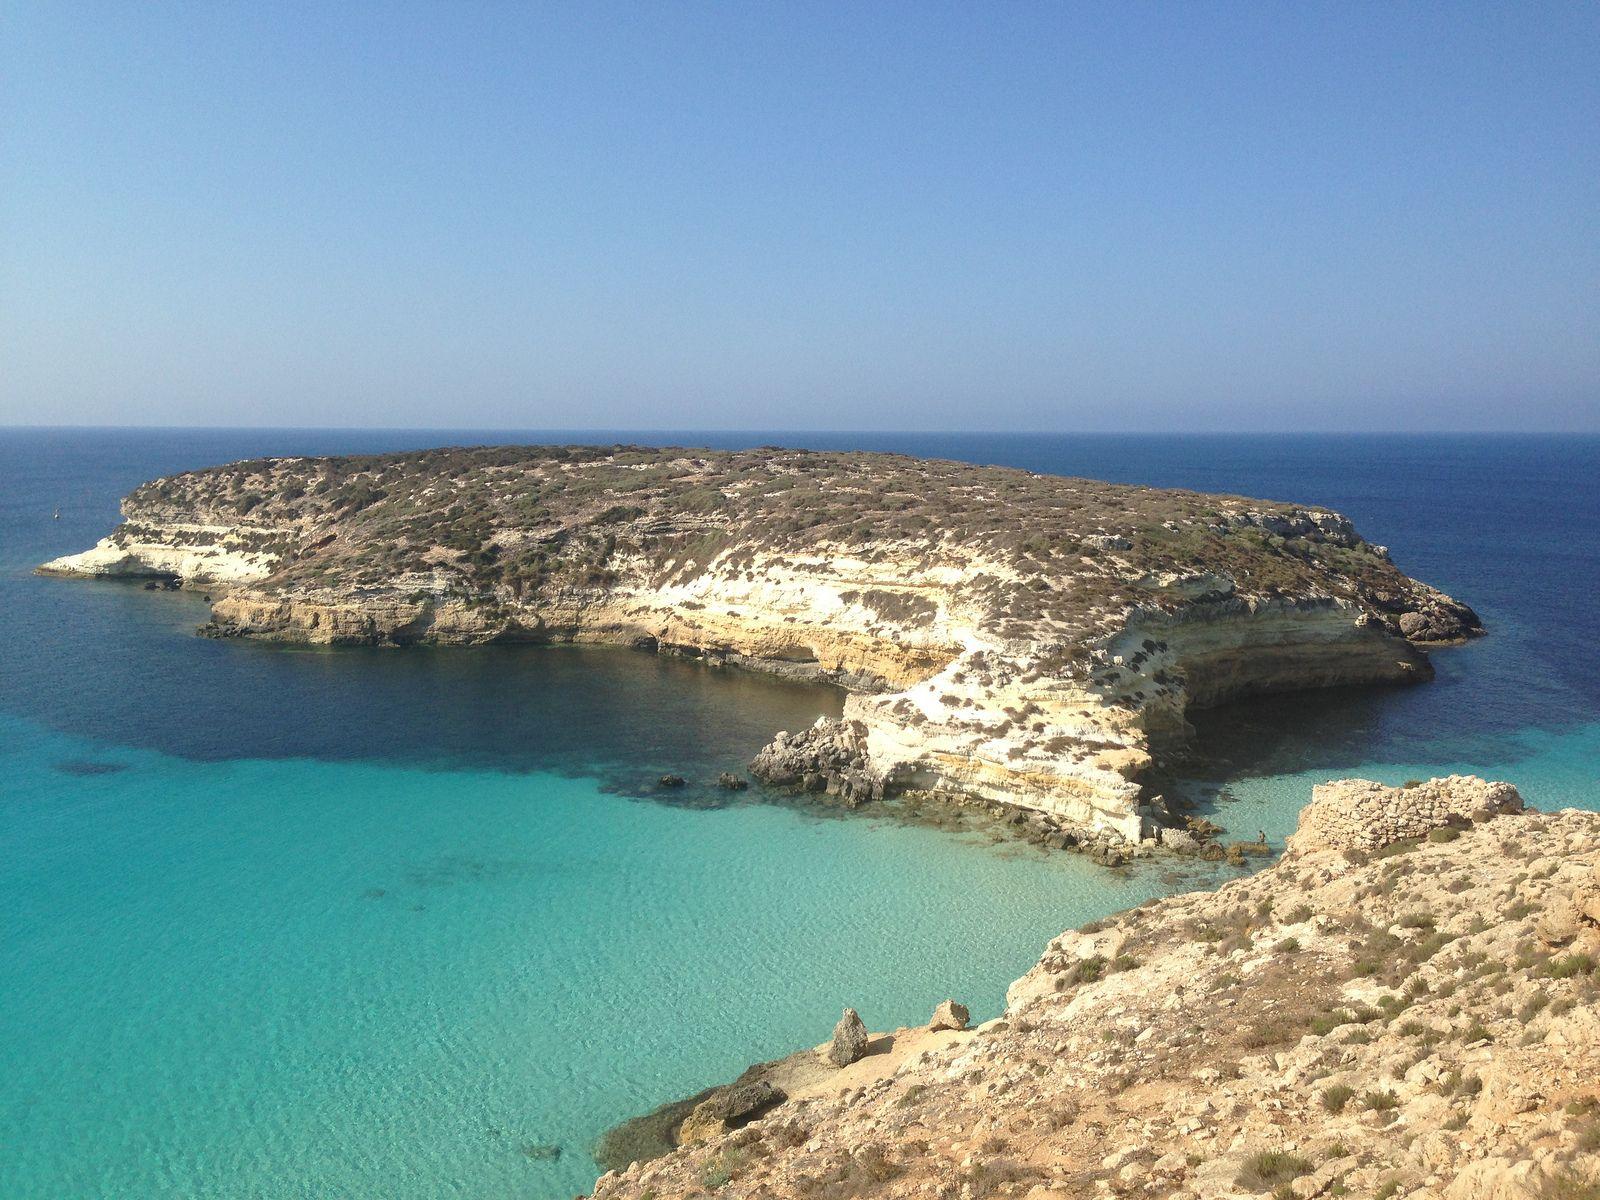 Lampedusa Island IG9/OE3GEA